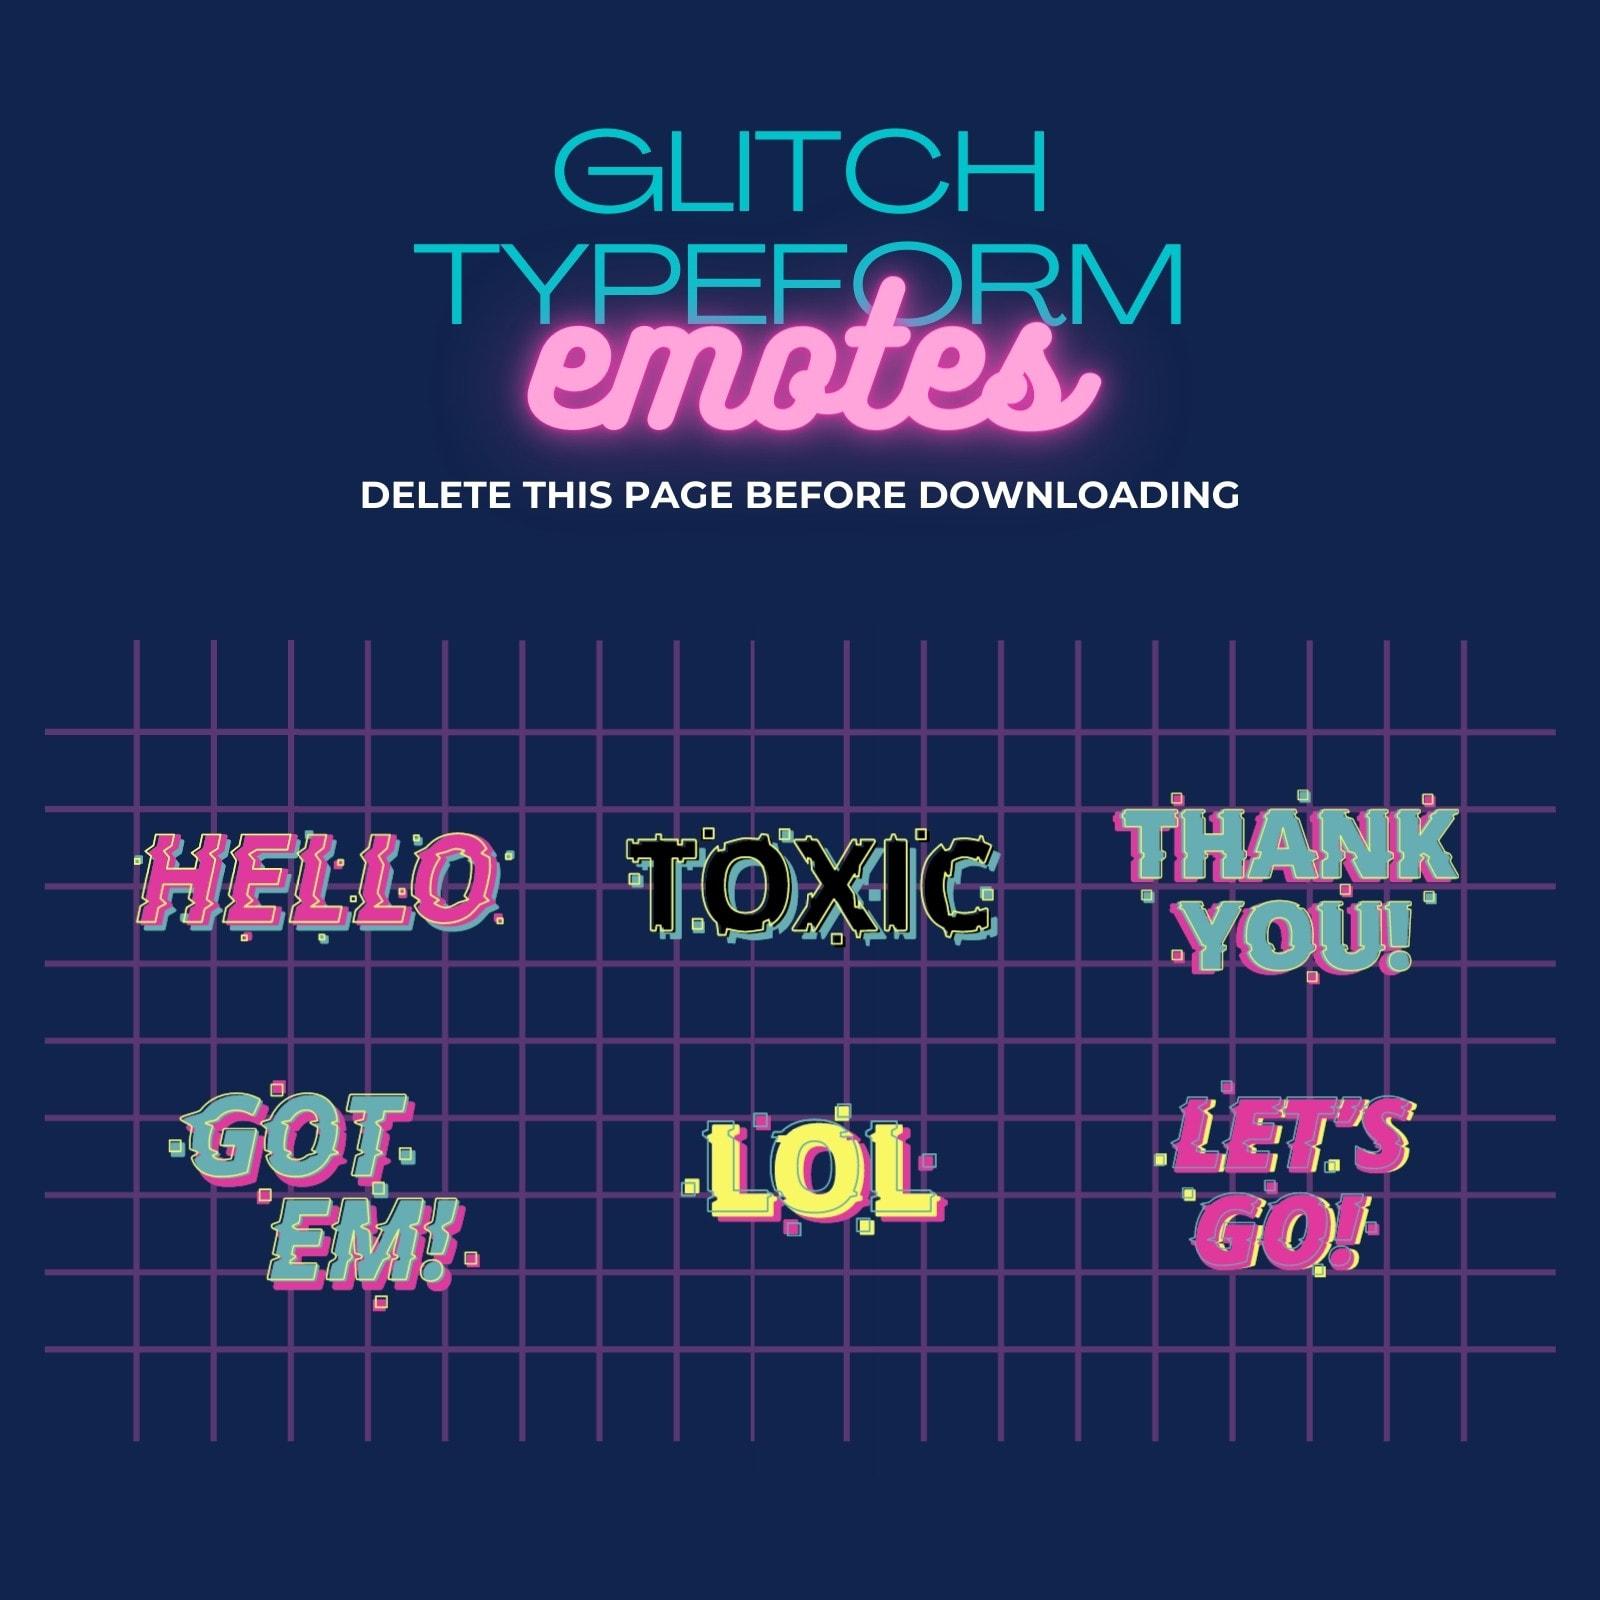 Pink Teal and Yellow Vintage Retro Glitch Typeform Twitch Emote